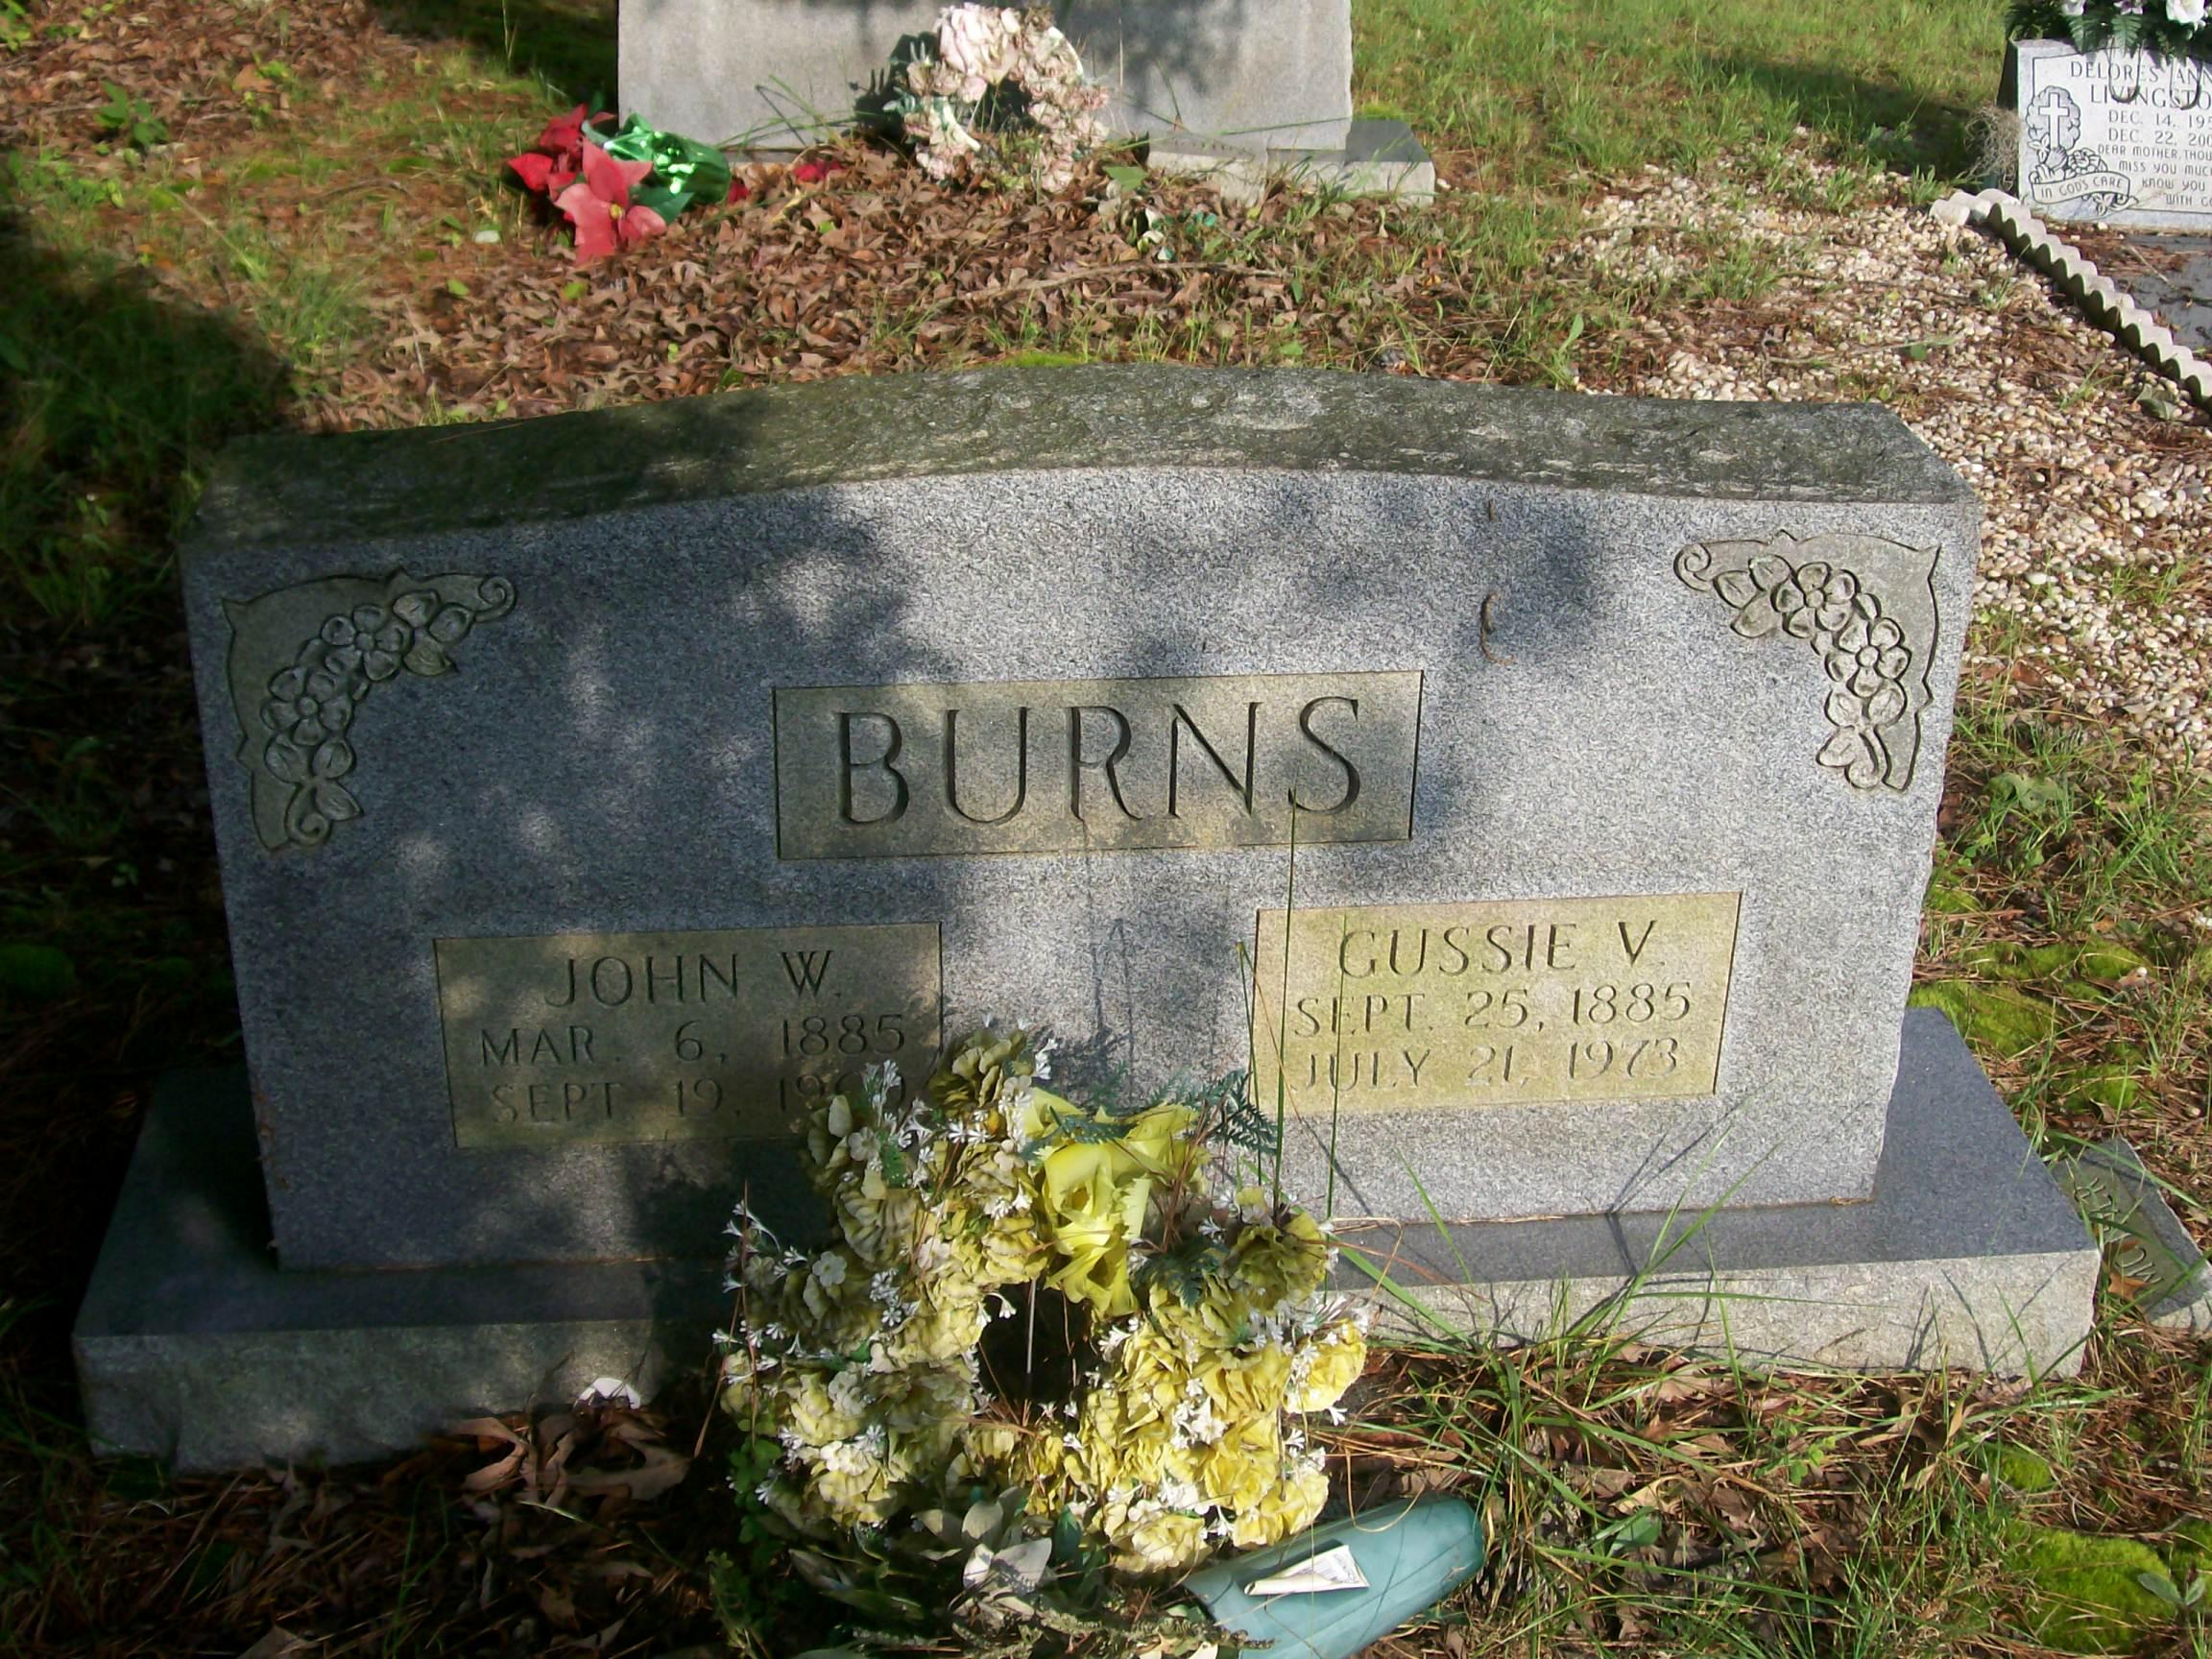 John W. Burns